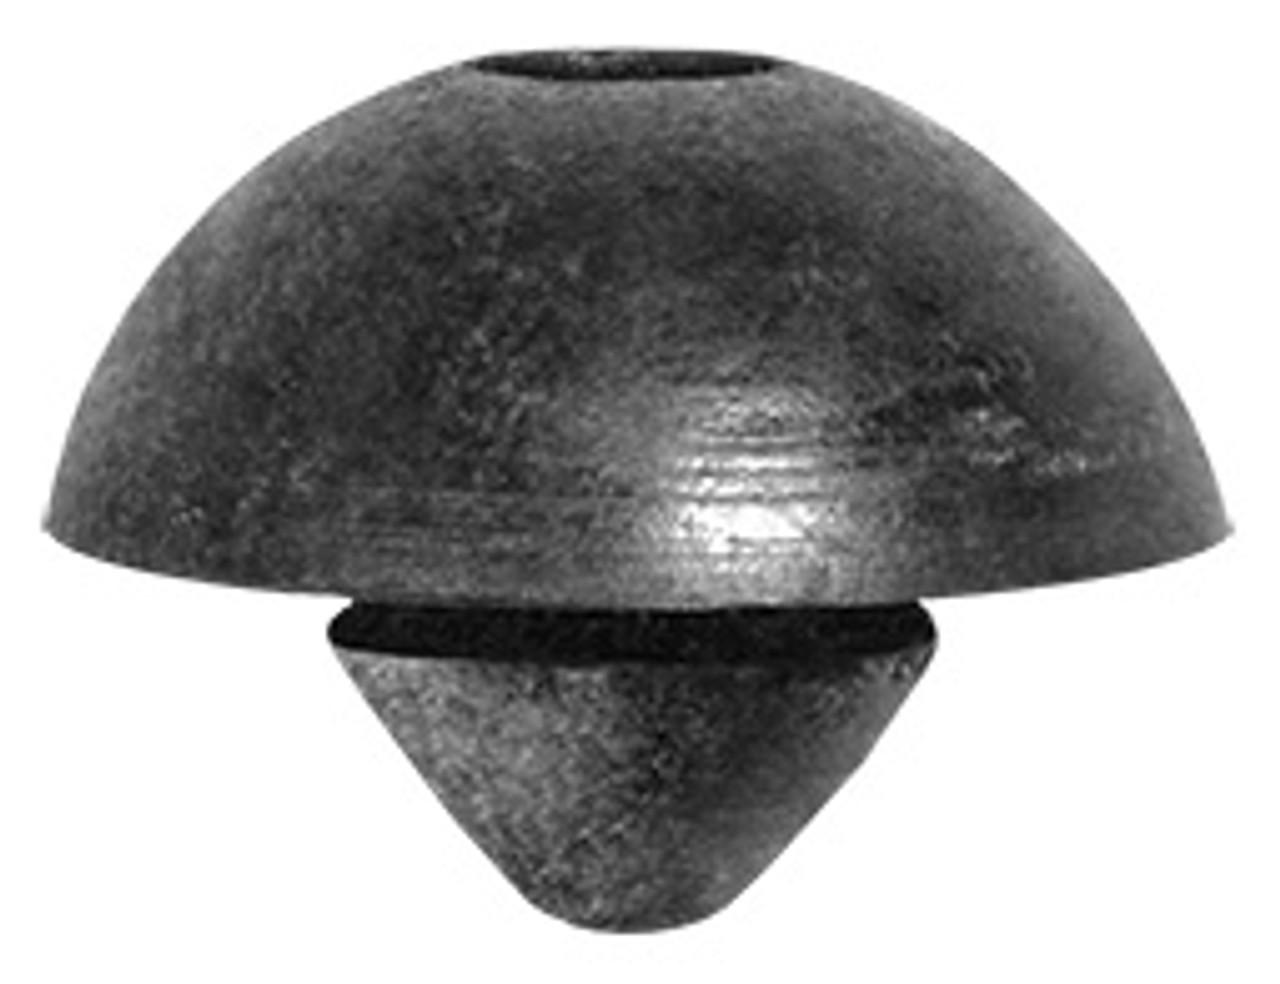 Rubber Bumper Head Diameter: 15mm Fits Into 6mm Hole Black Rubber 15 Per Box